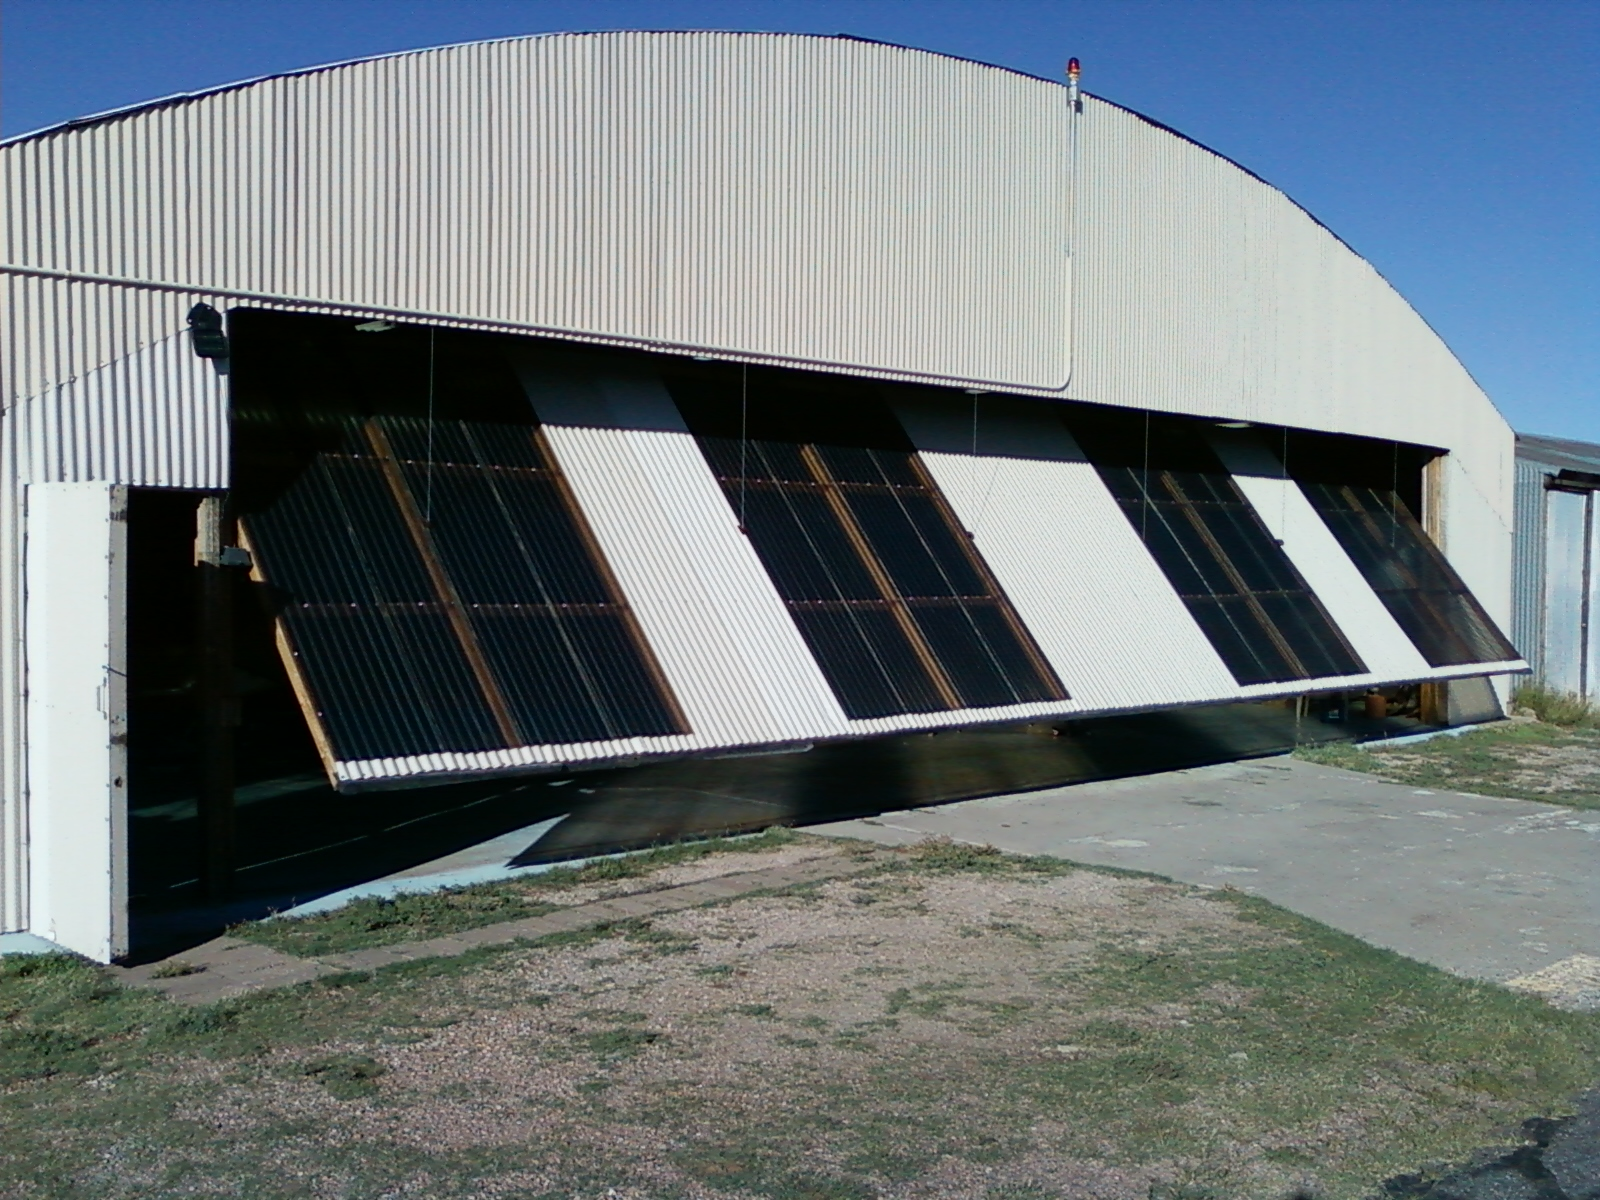 The Big Hangar